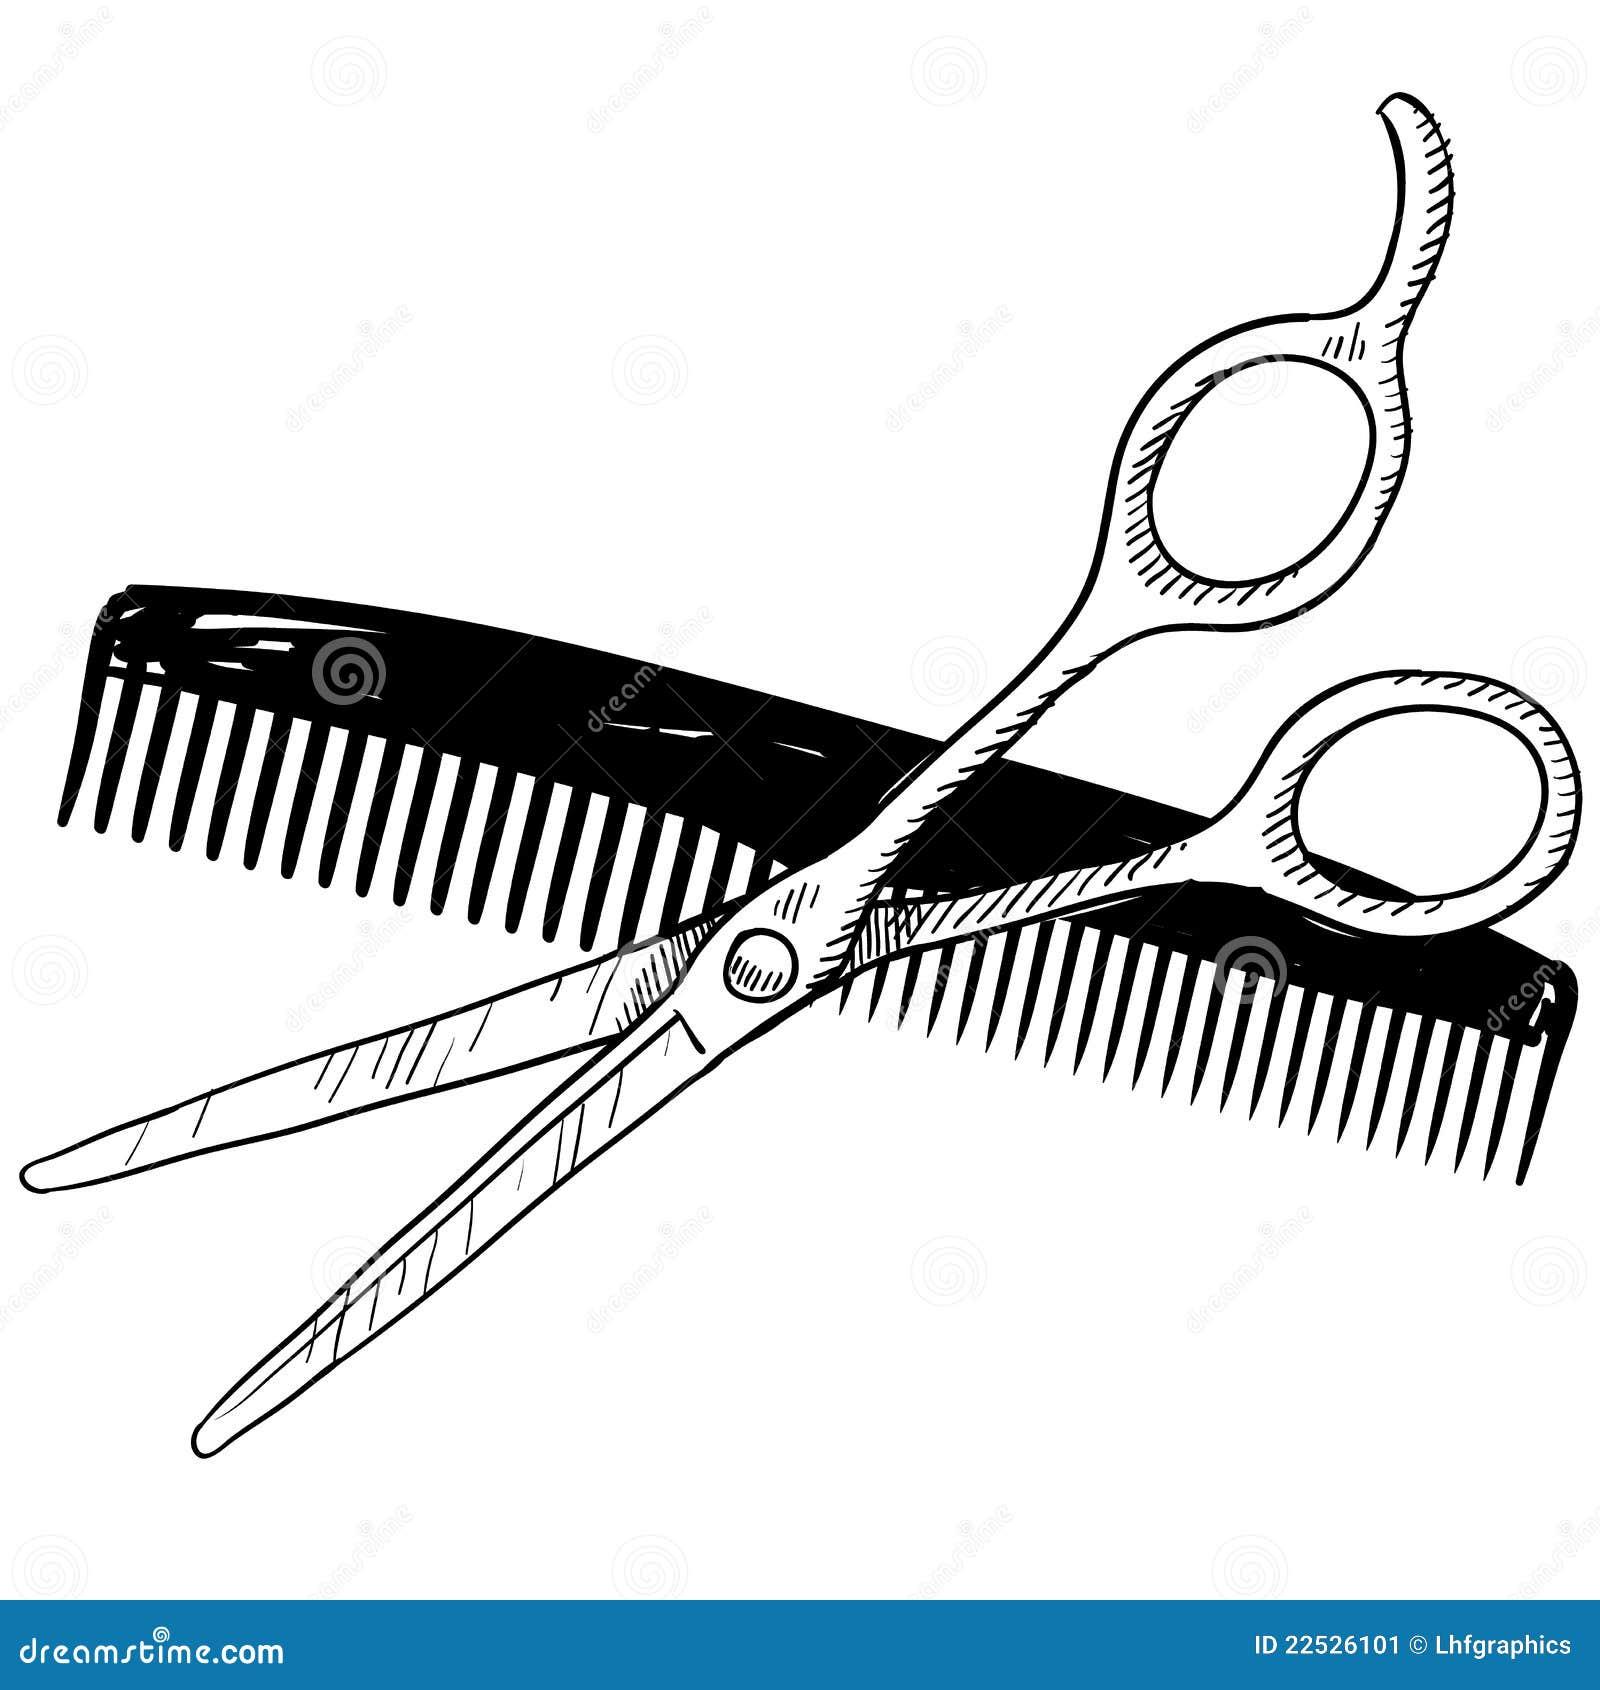 Мне парикмахер чикнул волосы наговицын